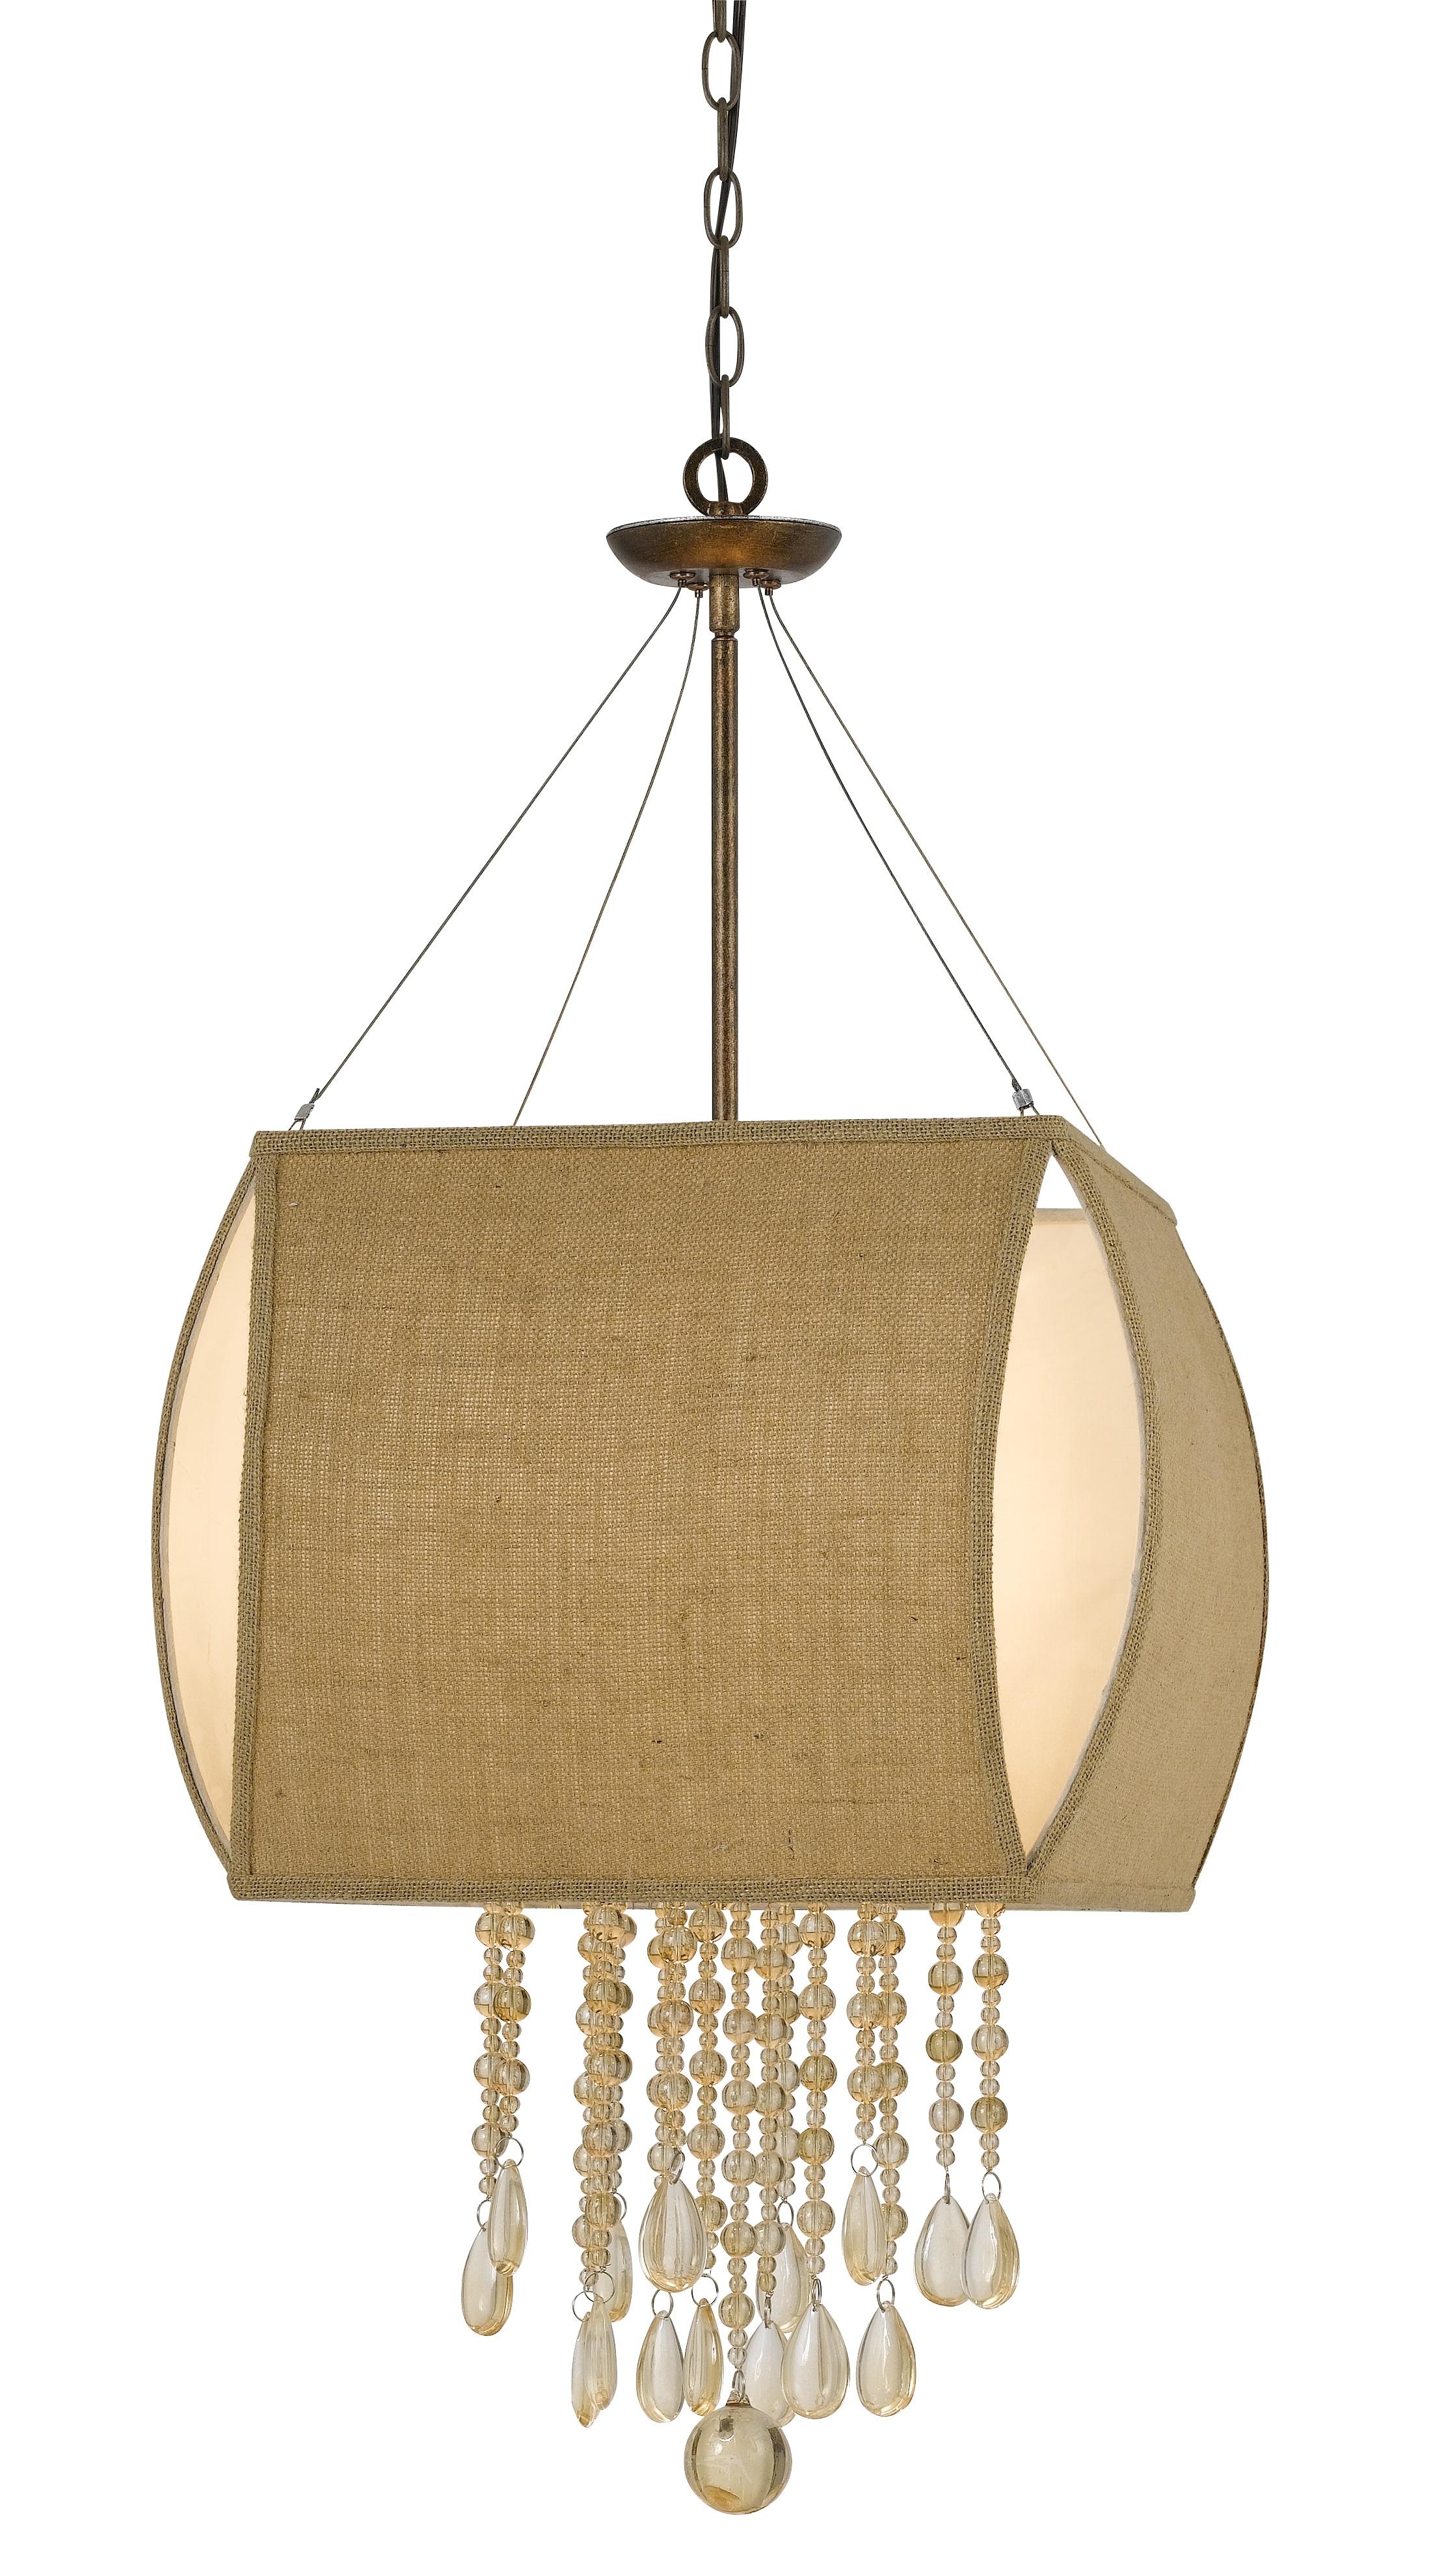 chandelier for dining best chandelier for dining room 2018